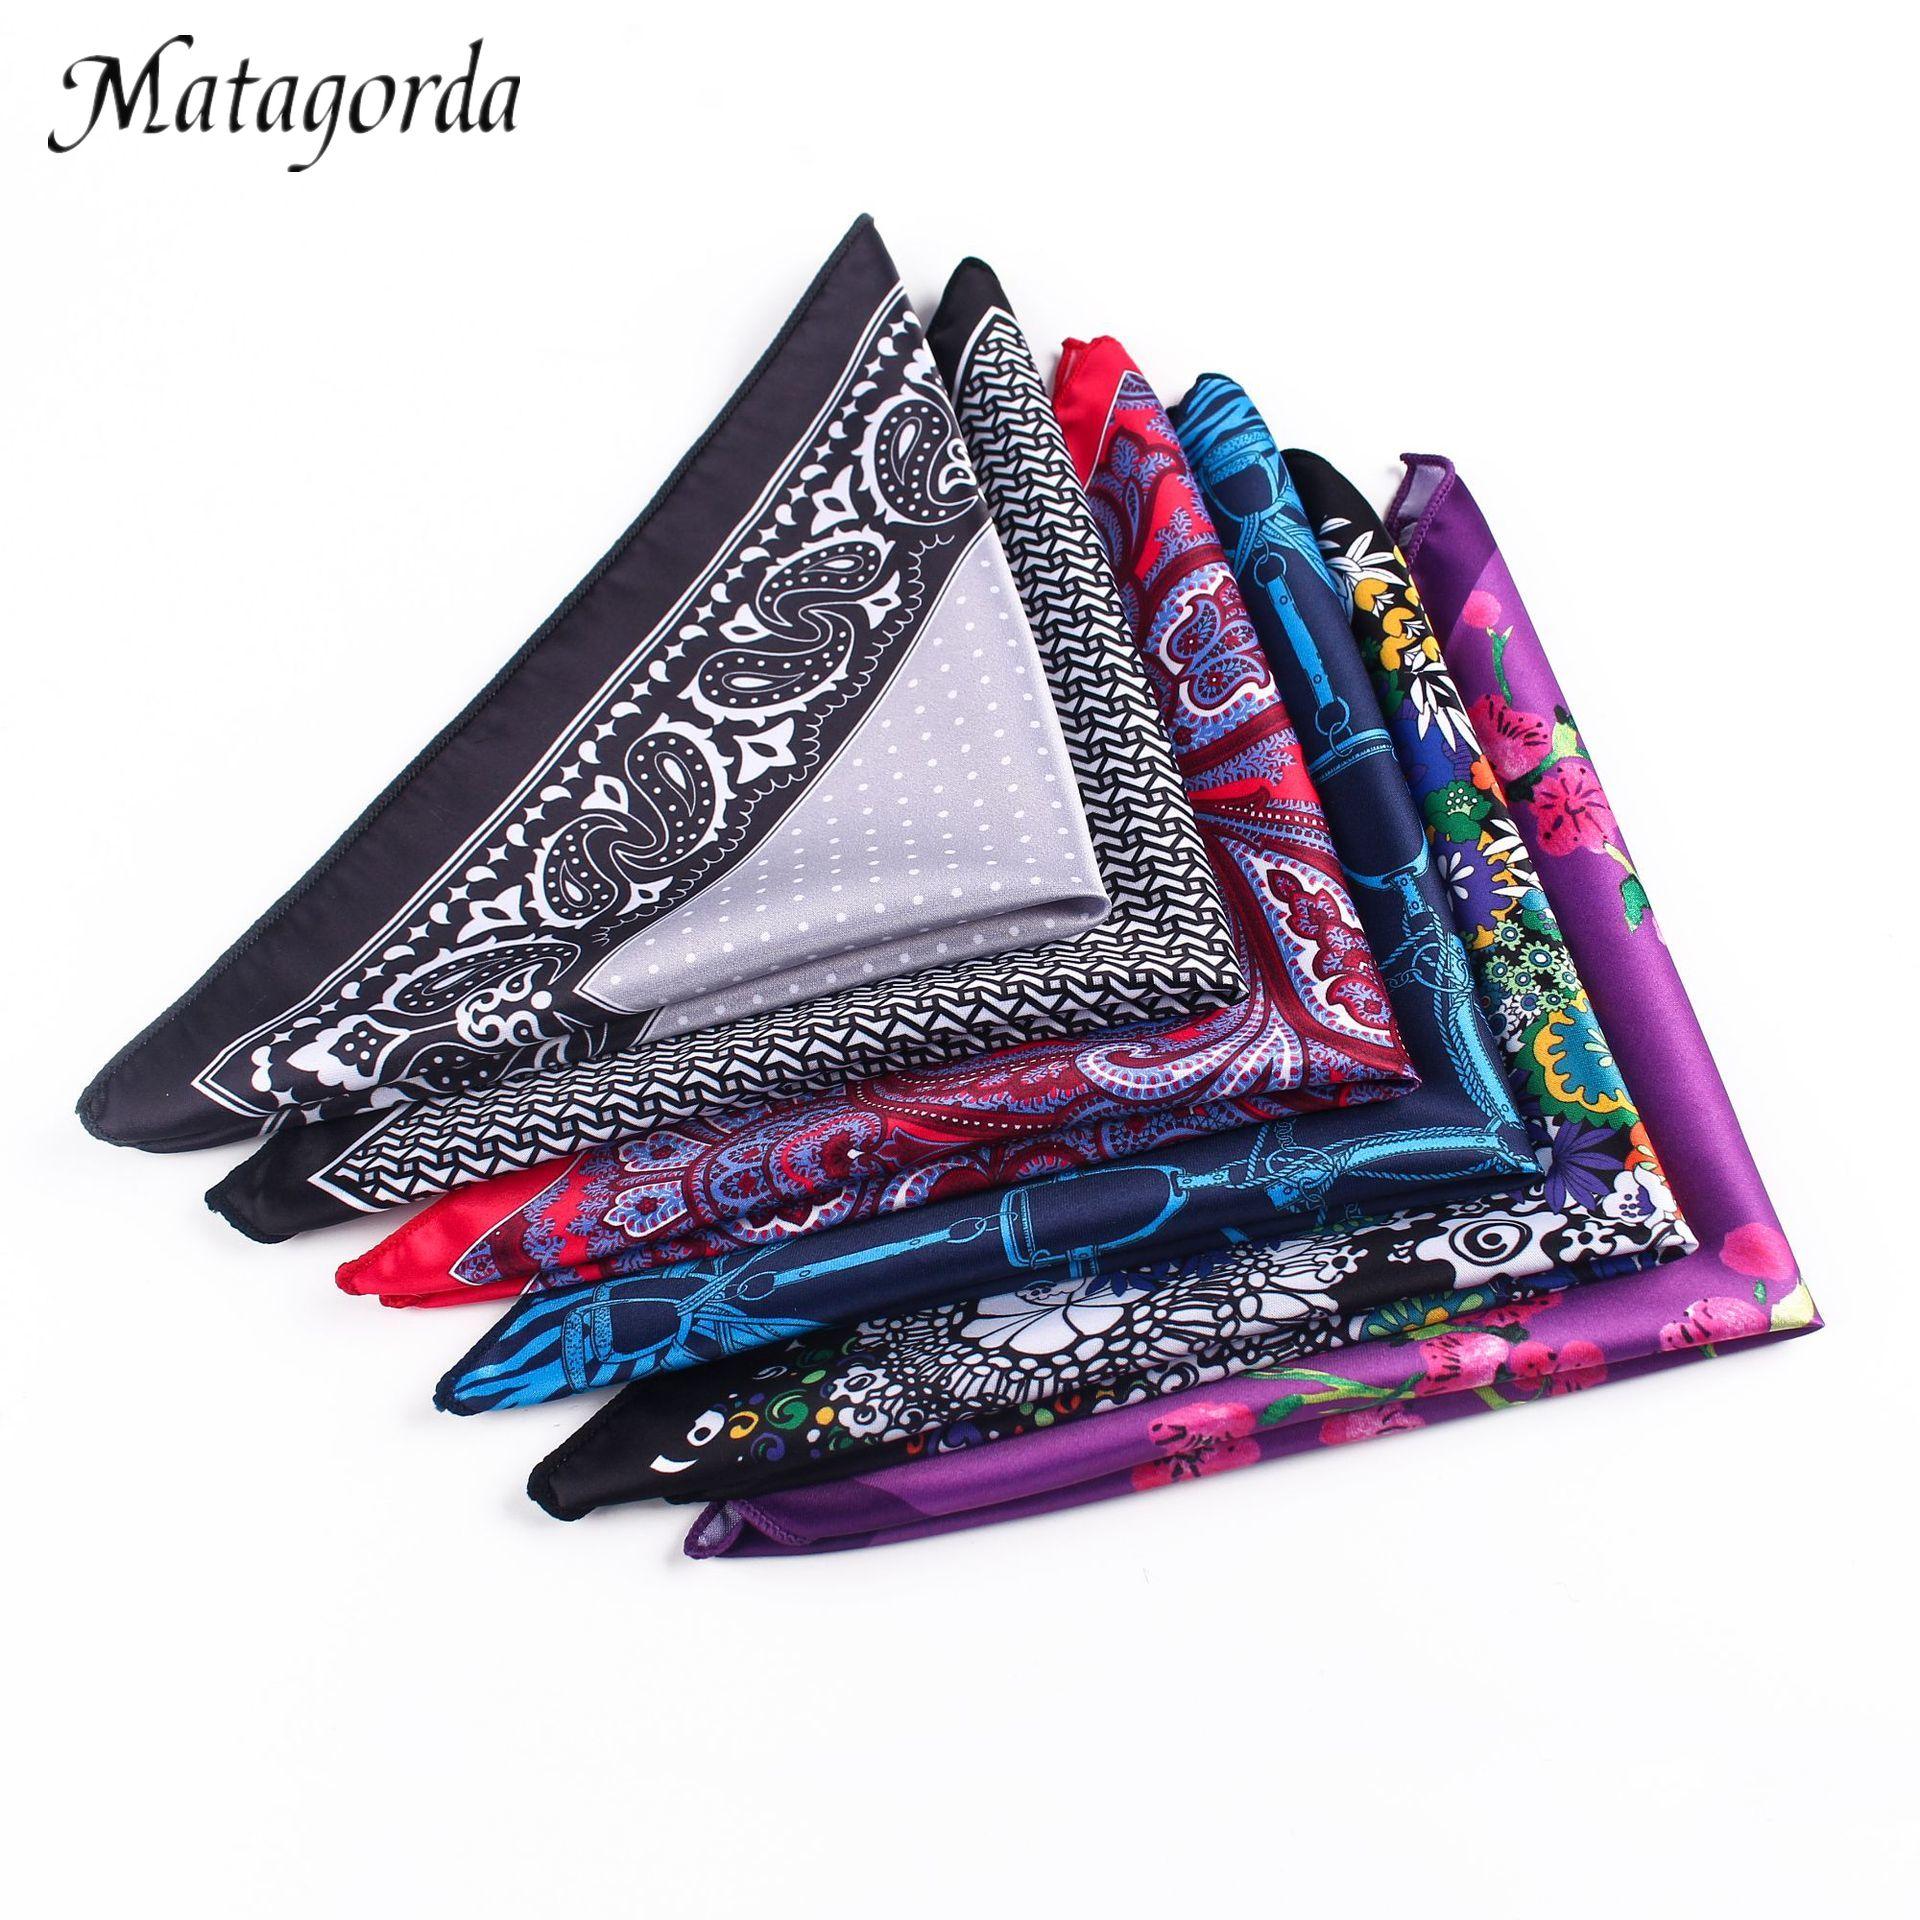 Luxury Brand Matagorda Men Handkerchief Silk Hanky Man Accessory Pocket Squared Handkerchief Scarf Paisley Dot Pringting Cravat